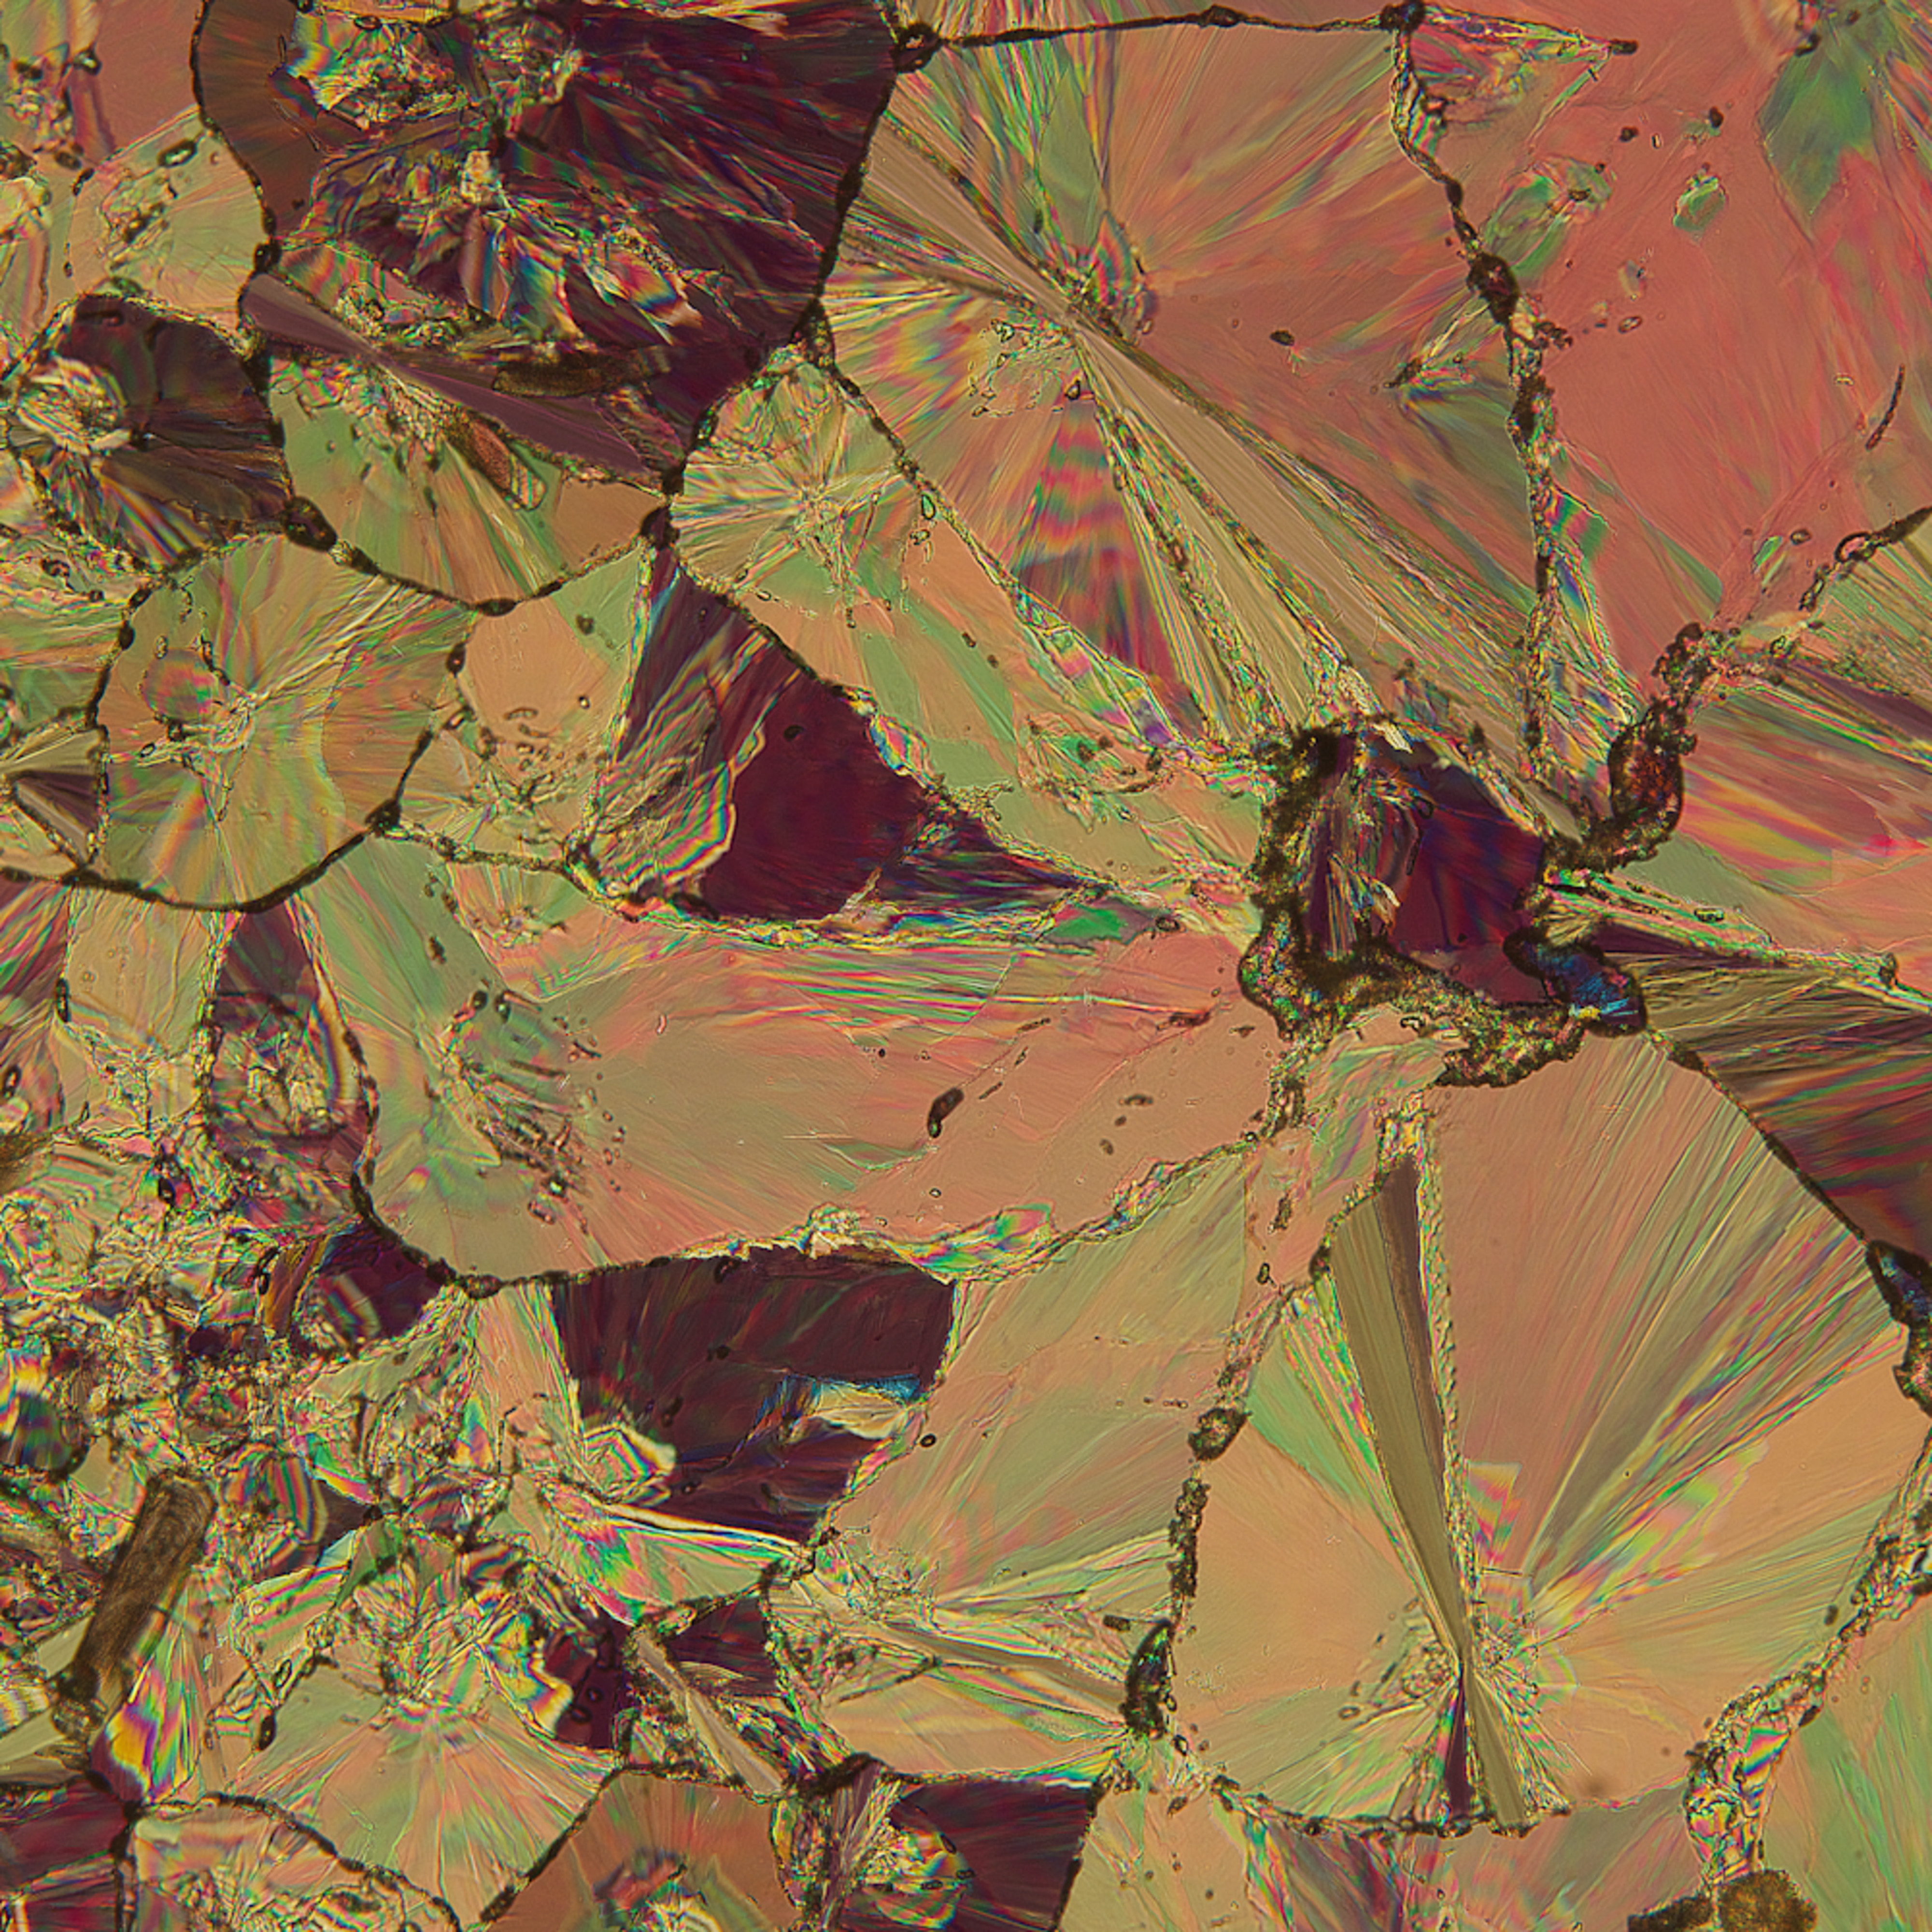 Wild granite rose hippuric acid gwcmbz